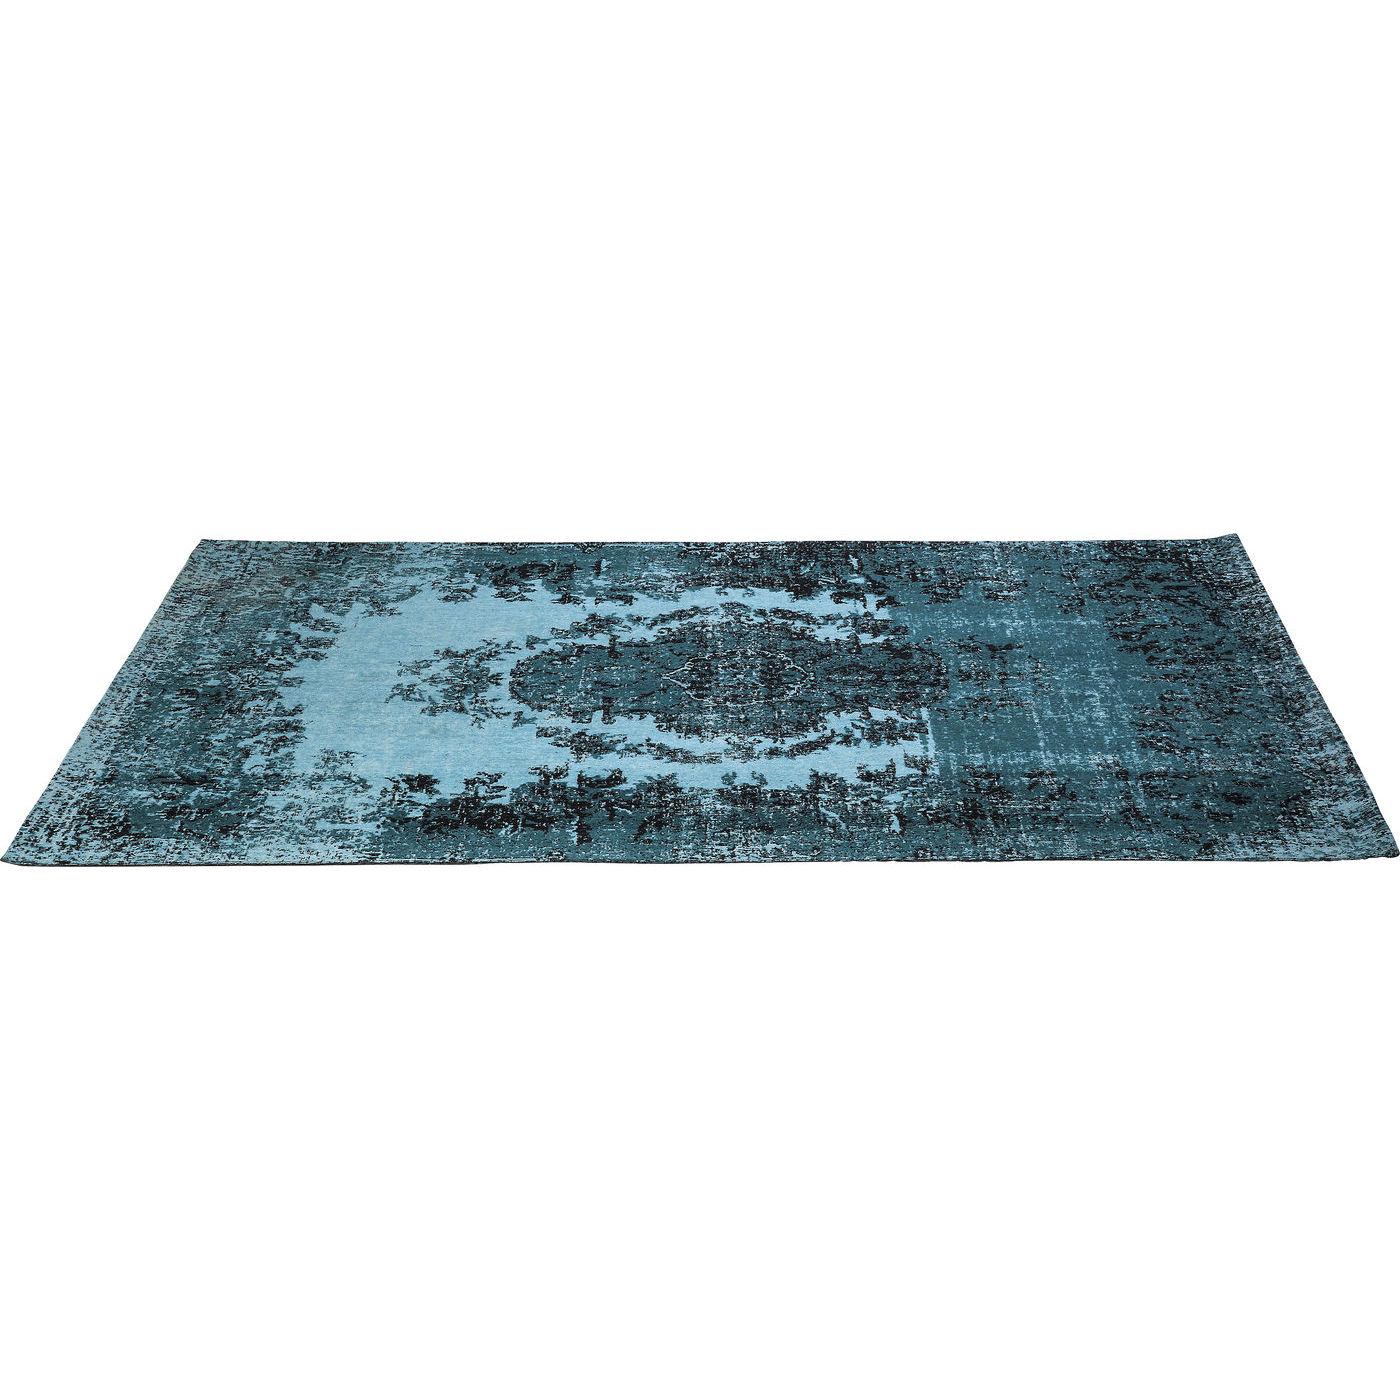 Image of   KARE DESIGN Tæppe, Kelim Pop Turquoise 240x170cm